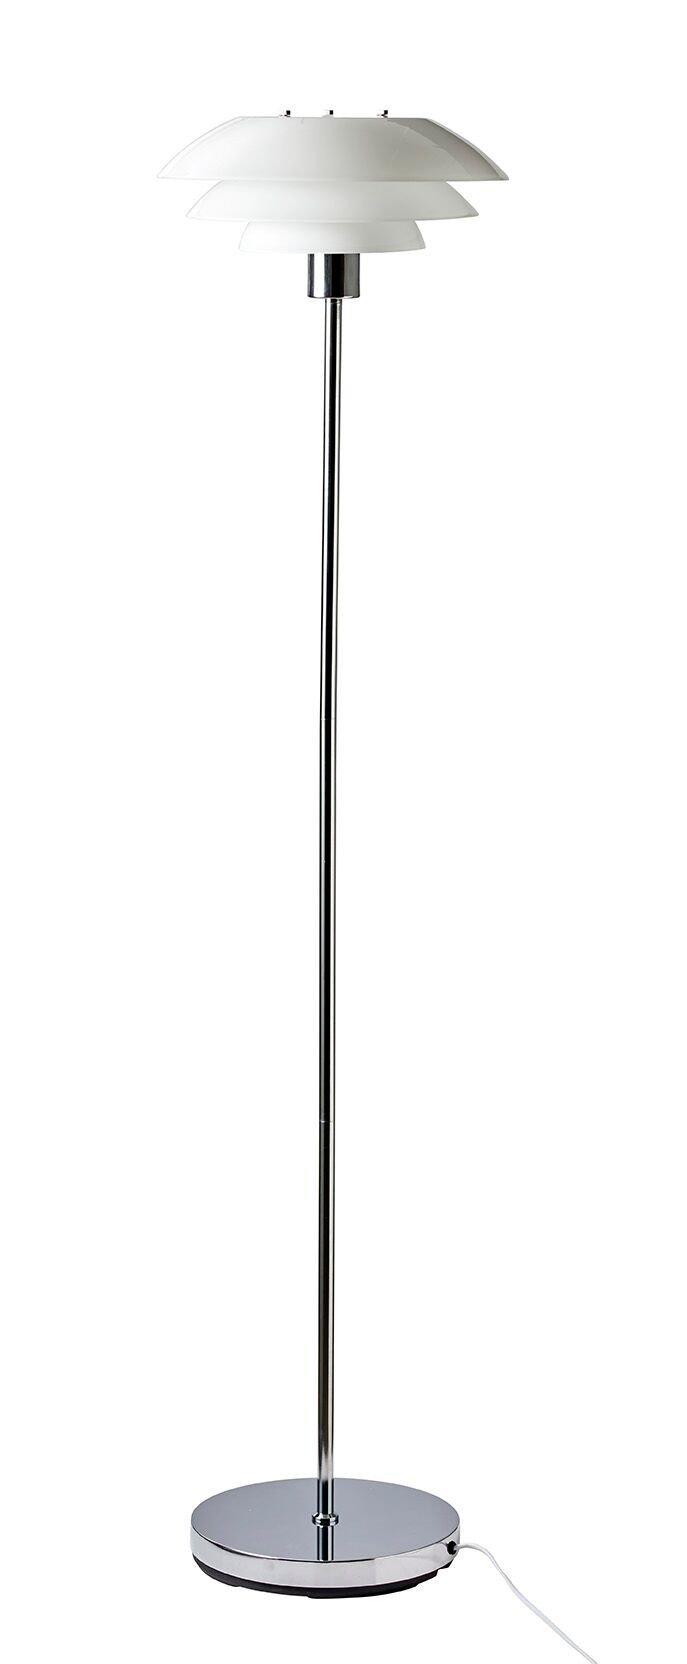 Image of   DL31 OPAL Gulv Lampe H133 D31